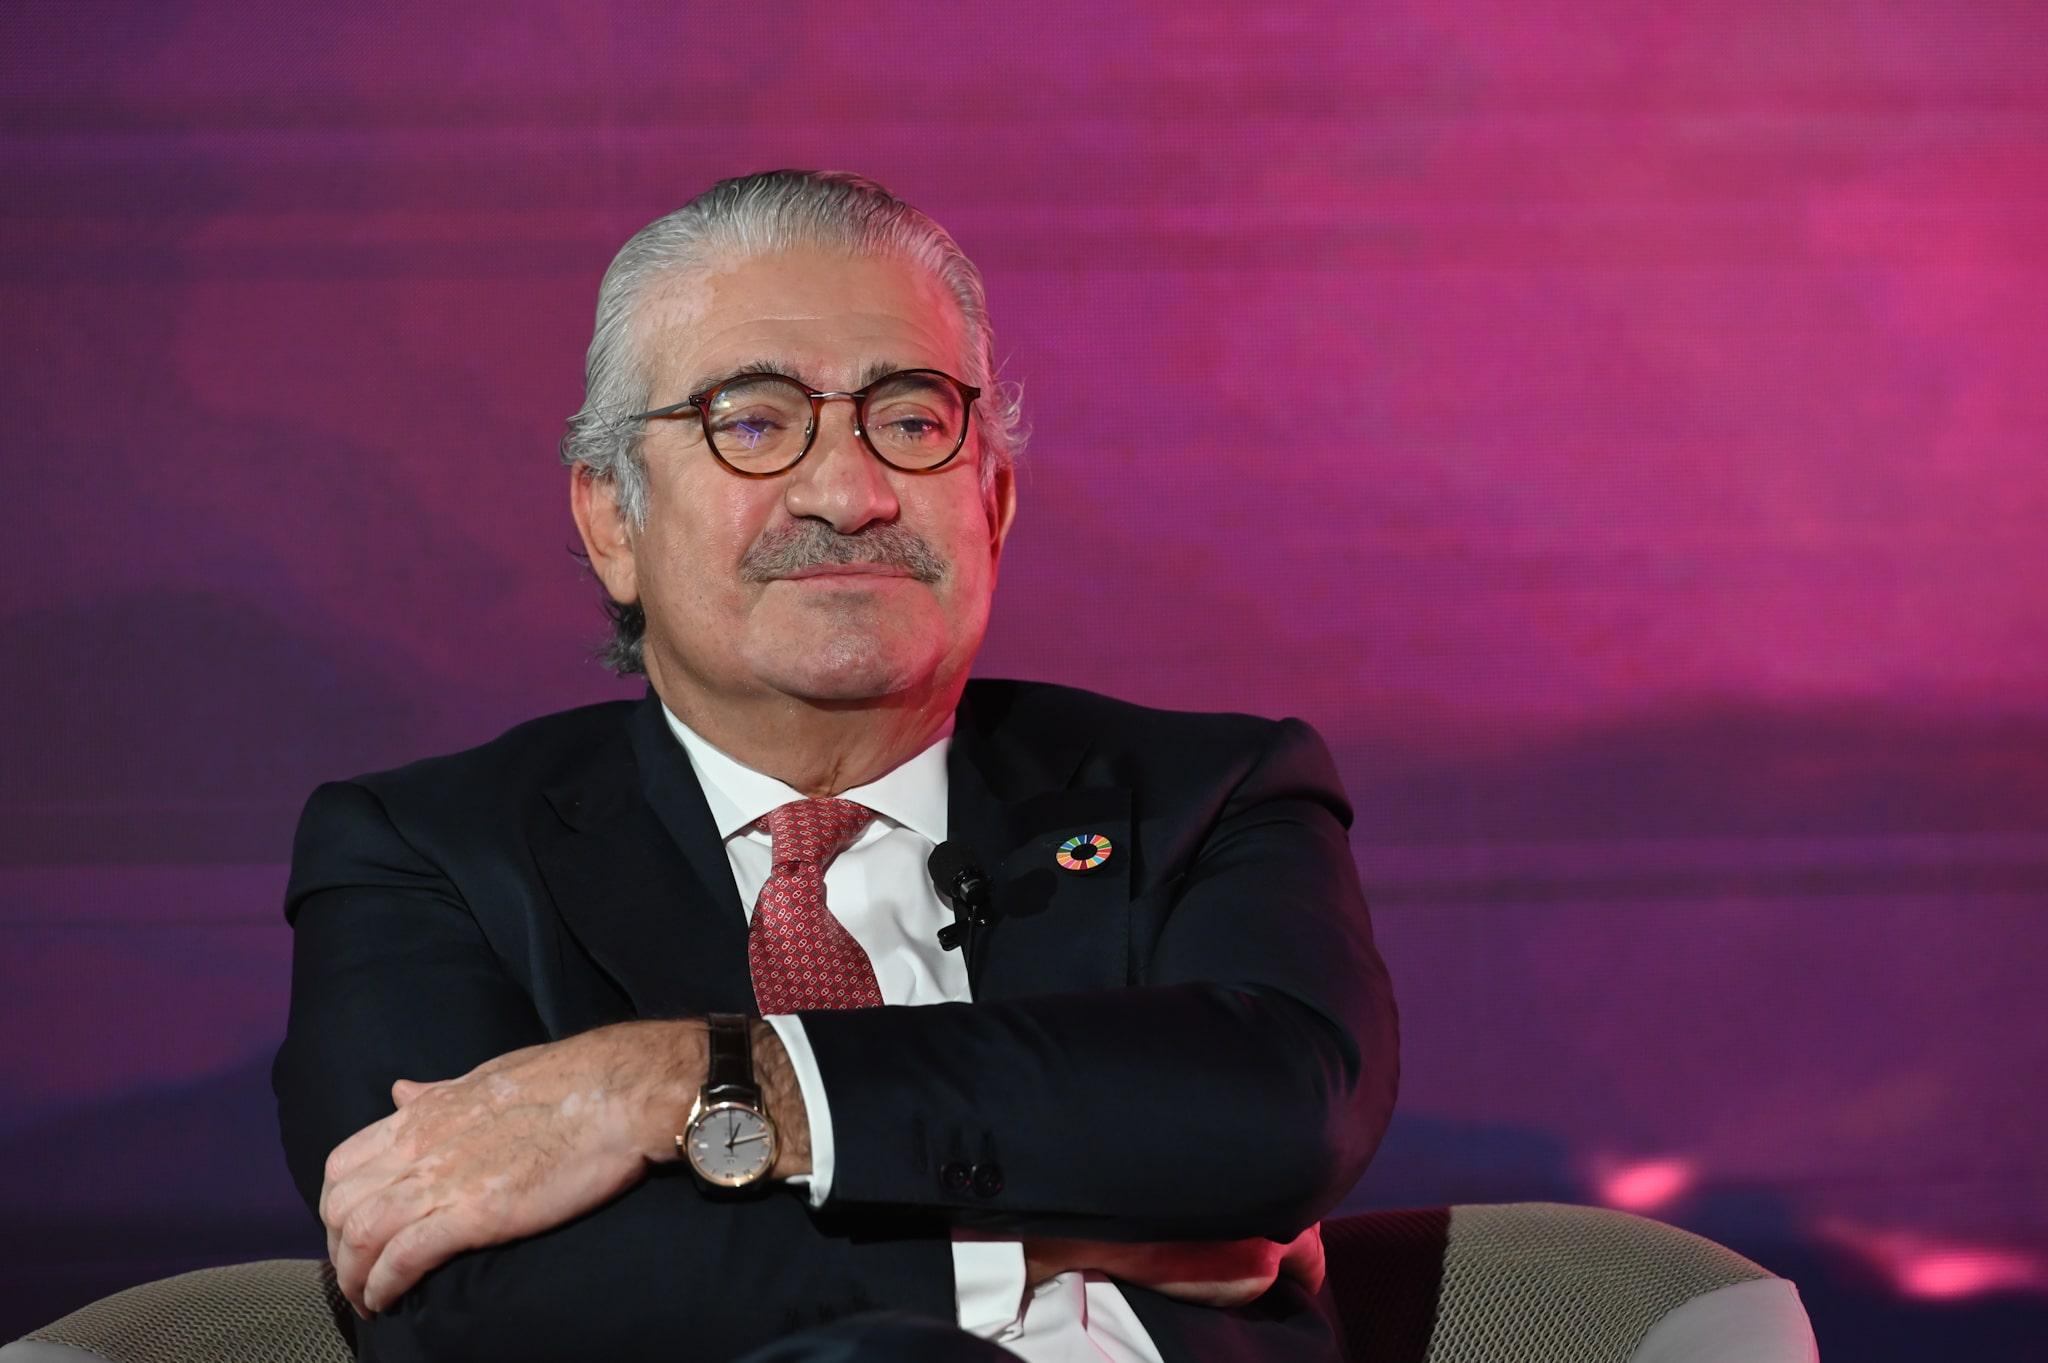 José Bogas, CEO de Endesa. @Endesa